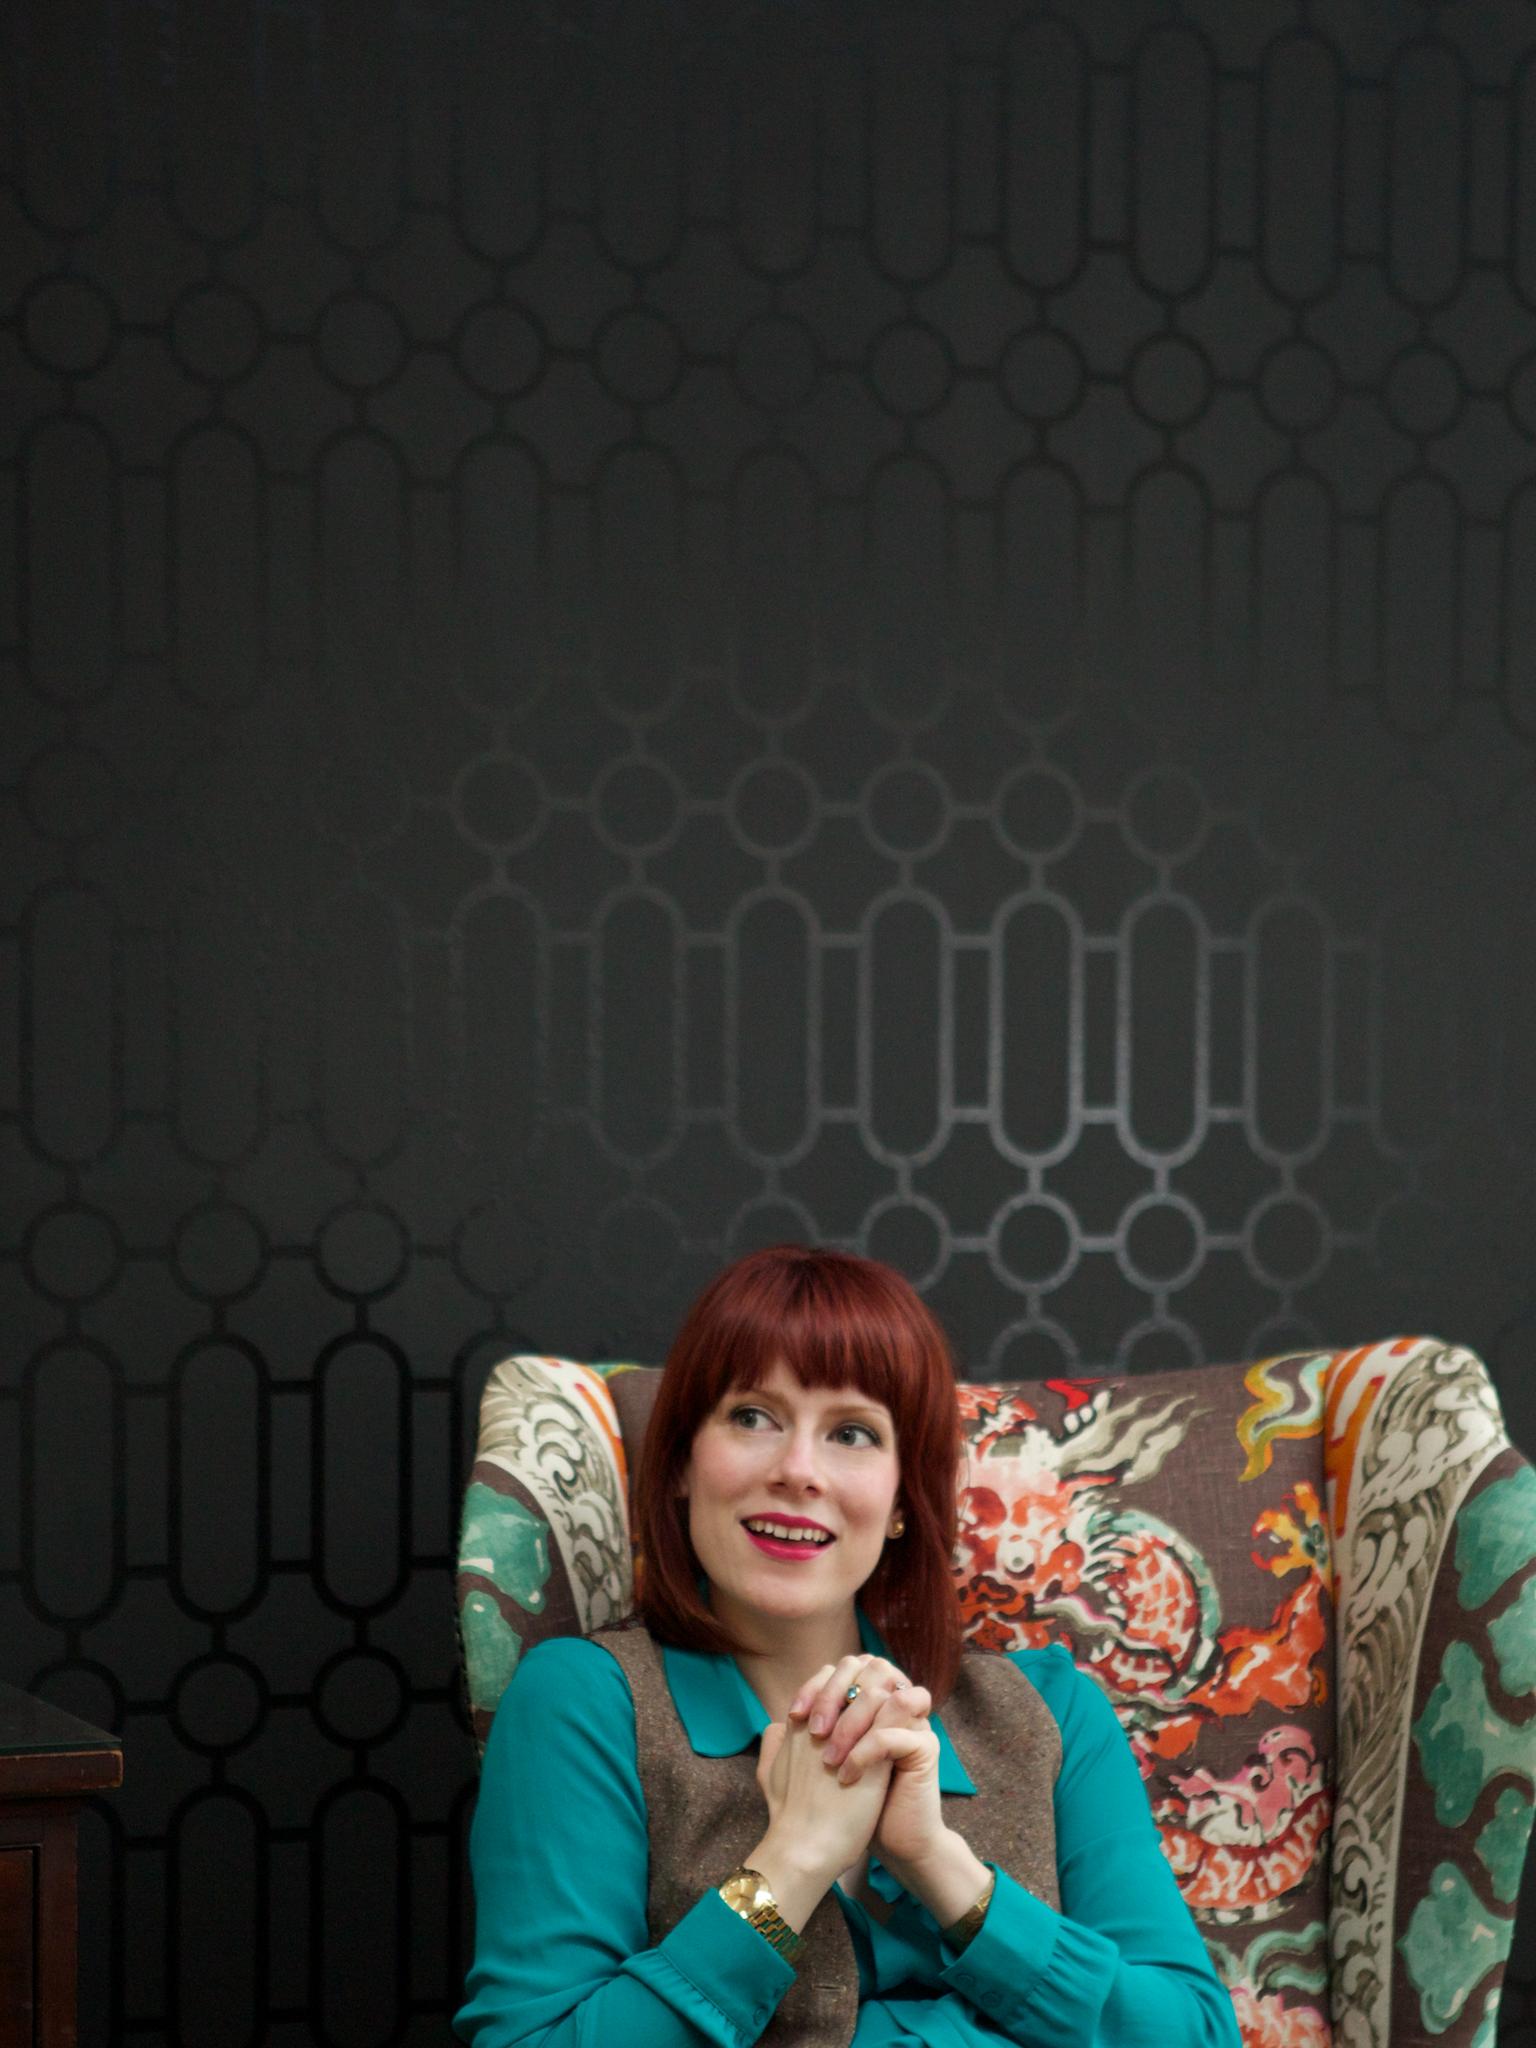 amanda-brown-spruce-upholstery-Citygram_Austin_2014-771